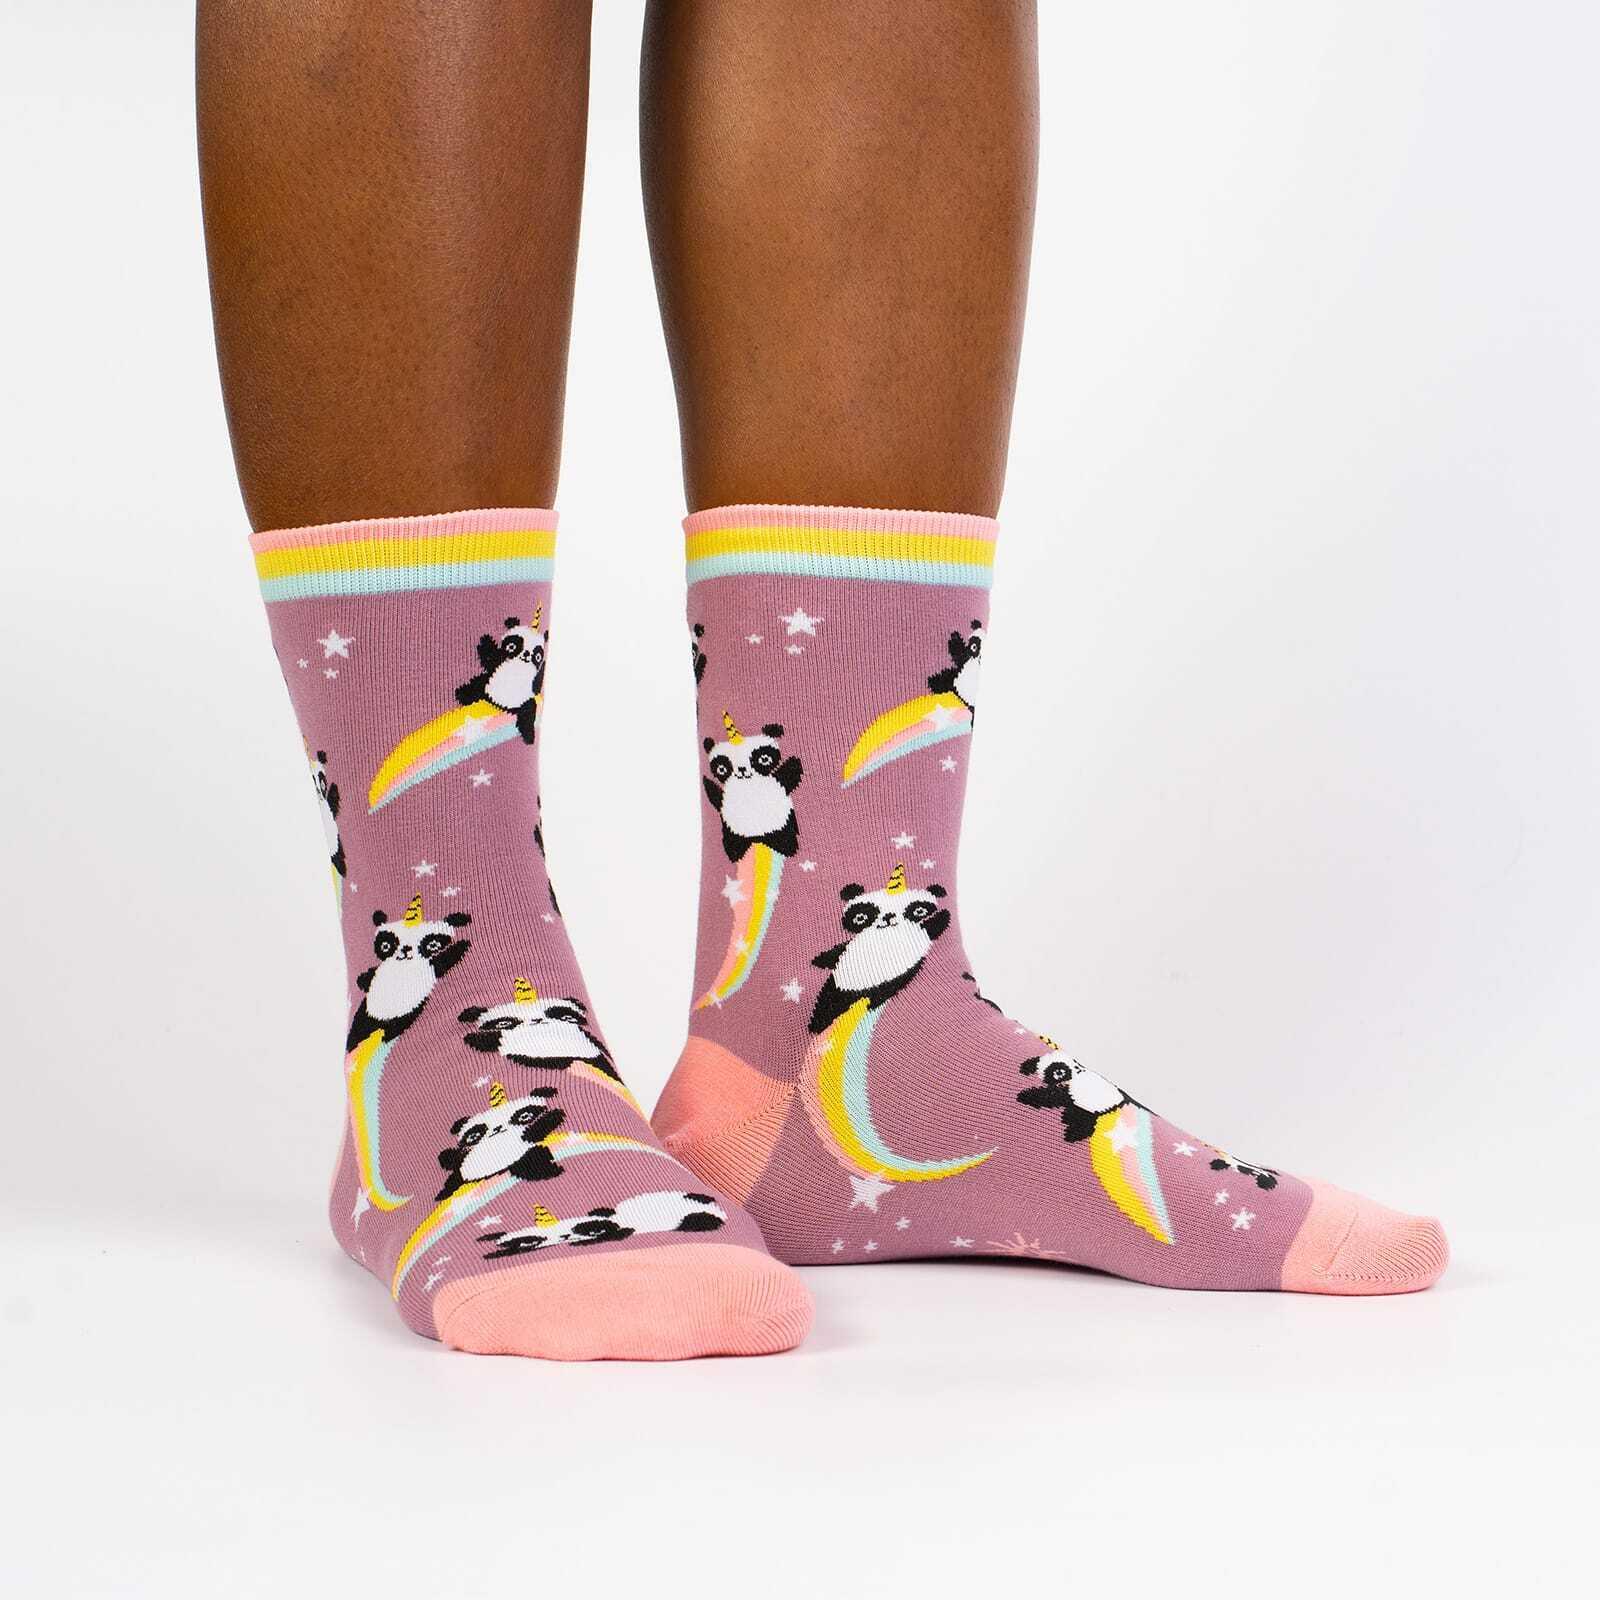 Pandacorn - Fun Mythical Panda Unicorn Crew Socks Pink - Women's in Pink